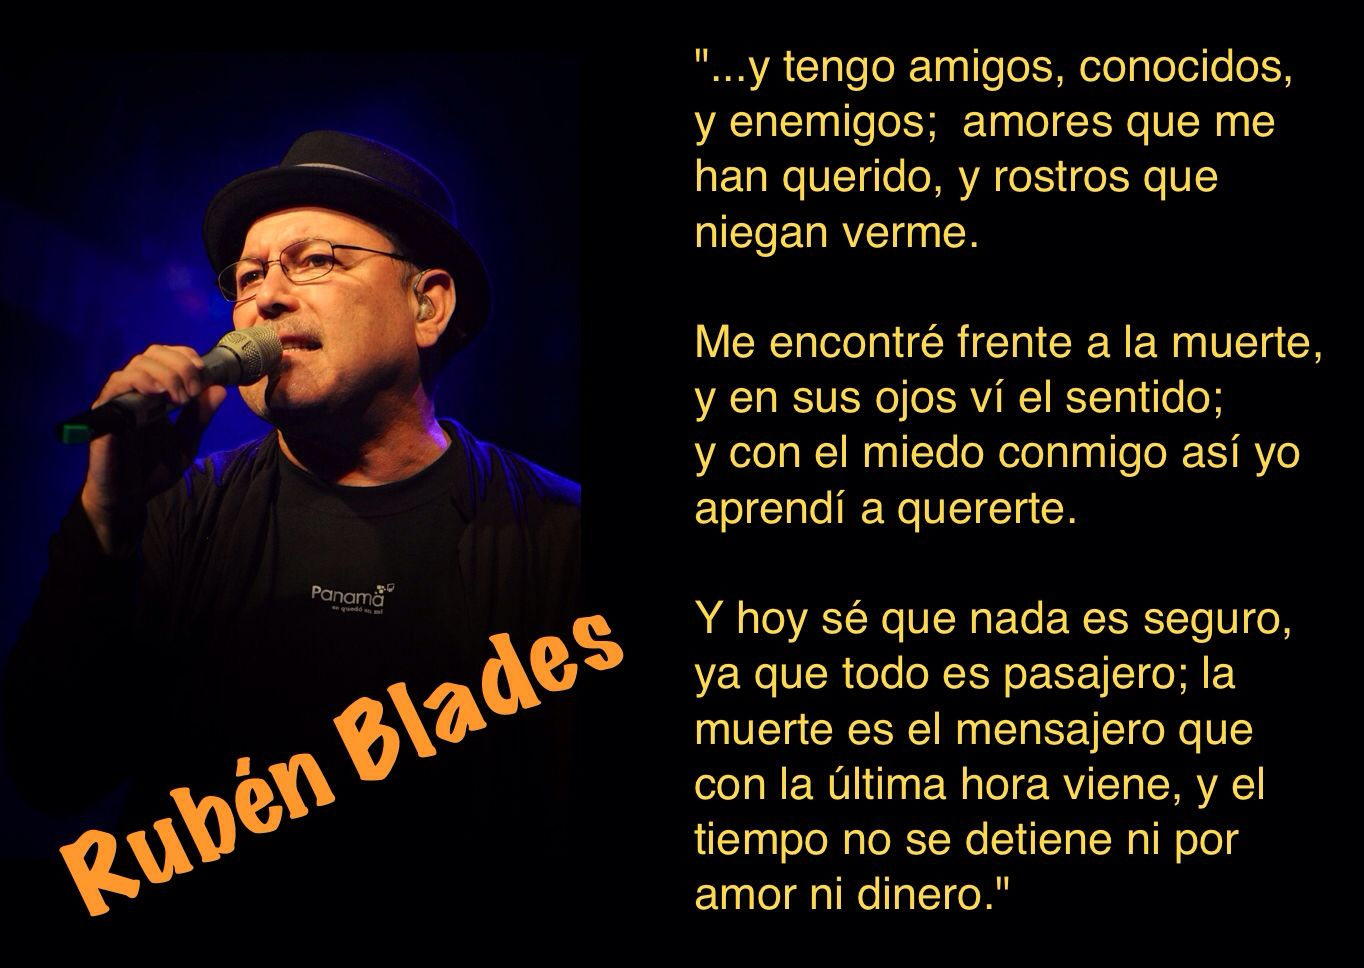 Rubén Blades - Maestra Vida #Panama